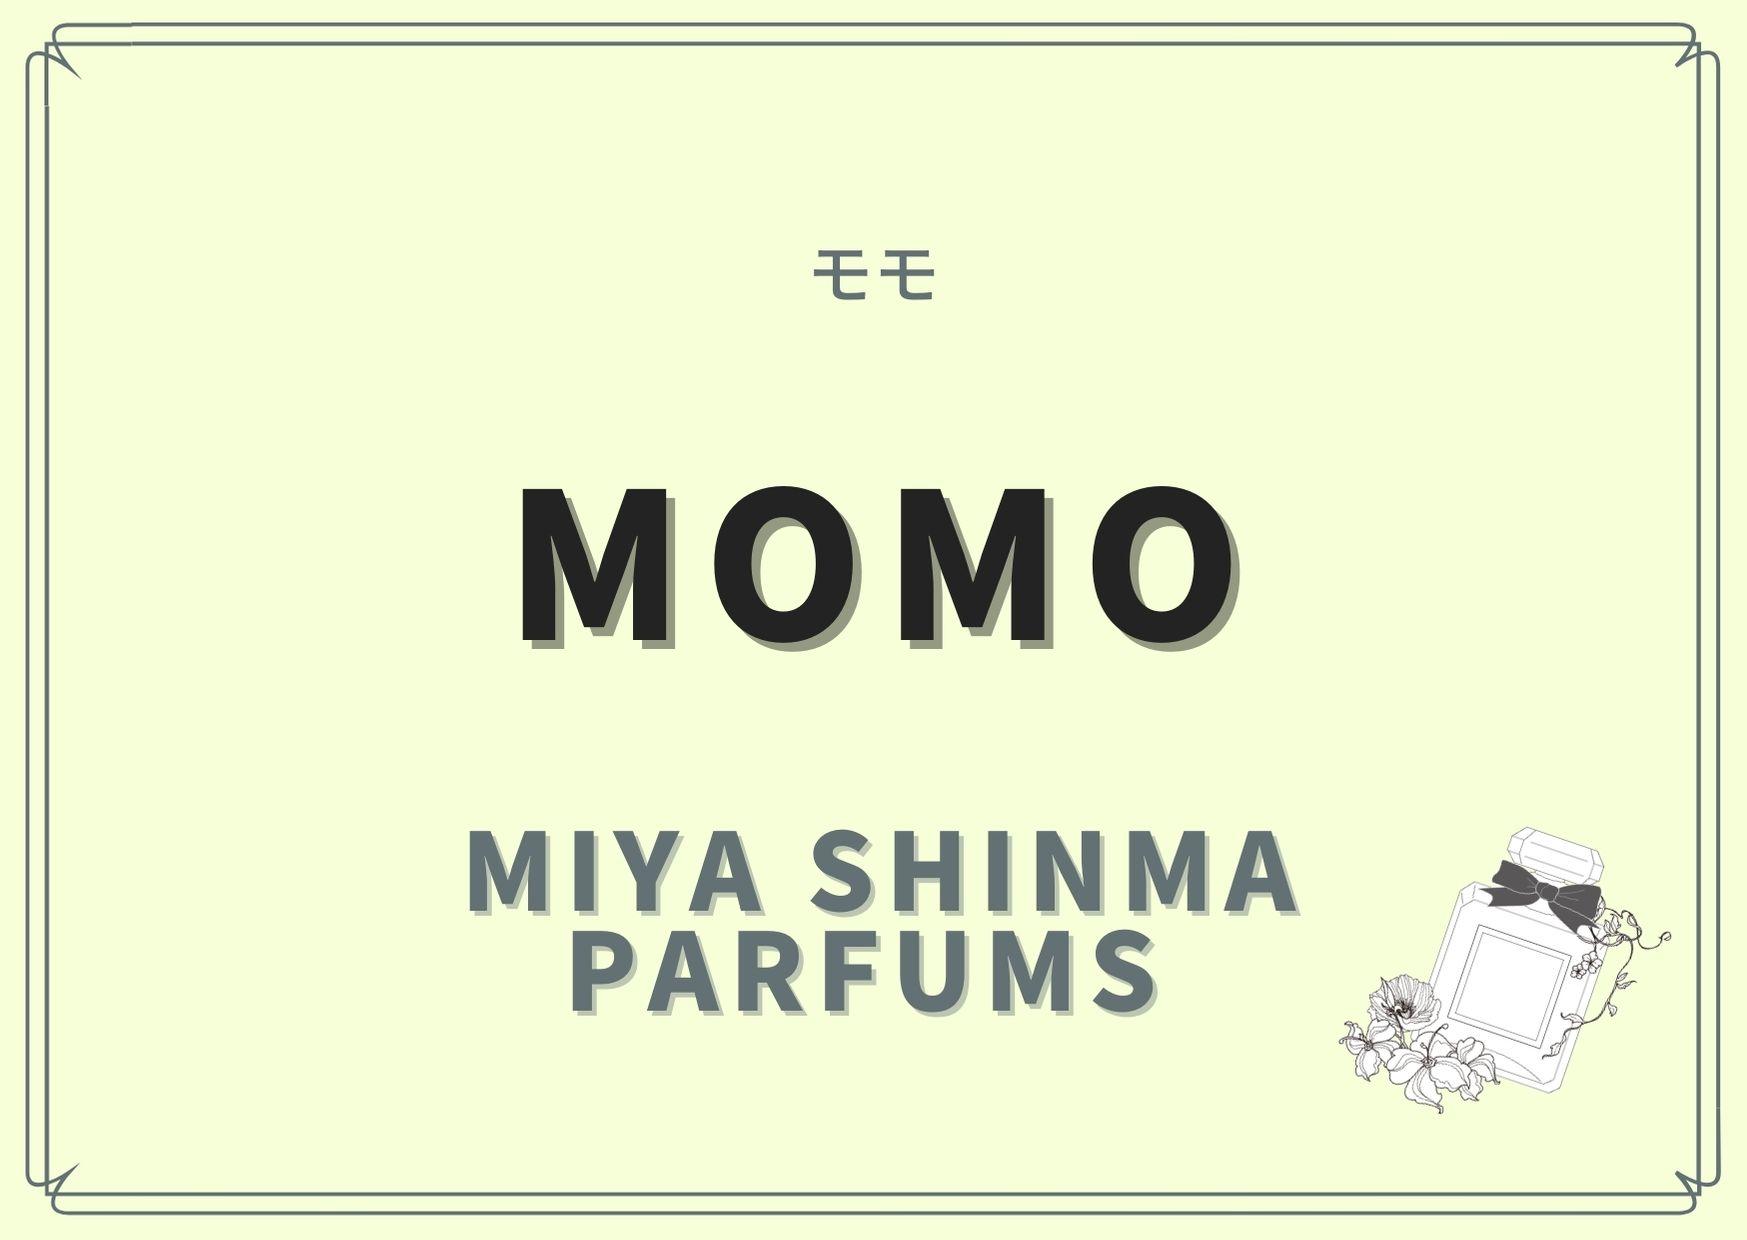 MOMO(モモ)/Miya Shinma parfums (ミヤ シンマ パルファン)